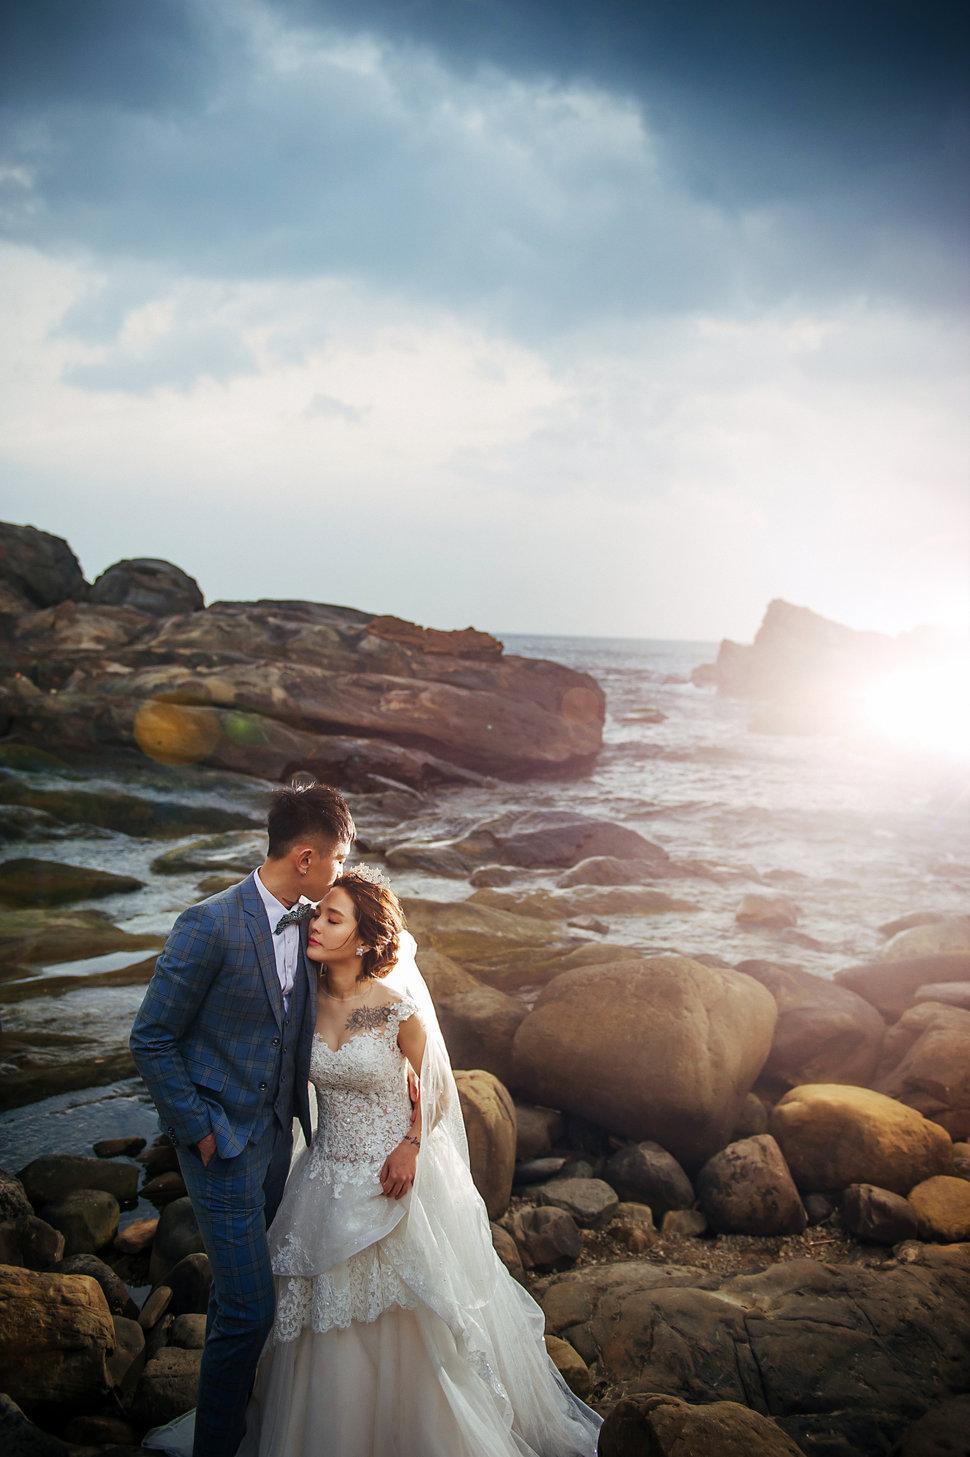 DSC_3296 - DOLBY IMAGE - 結婚吧